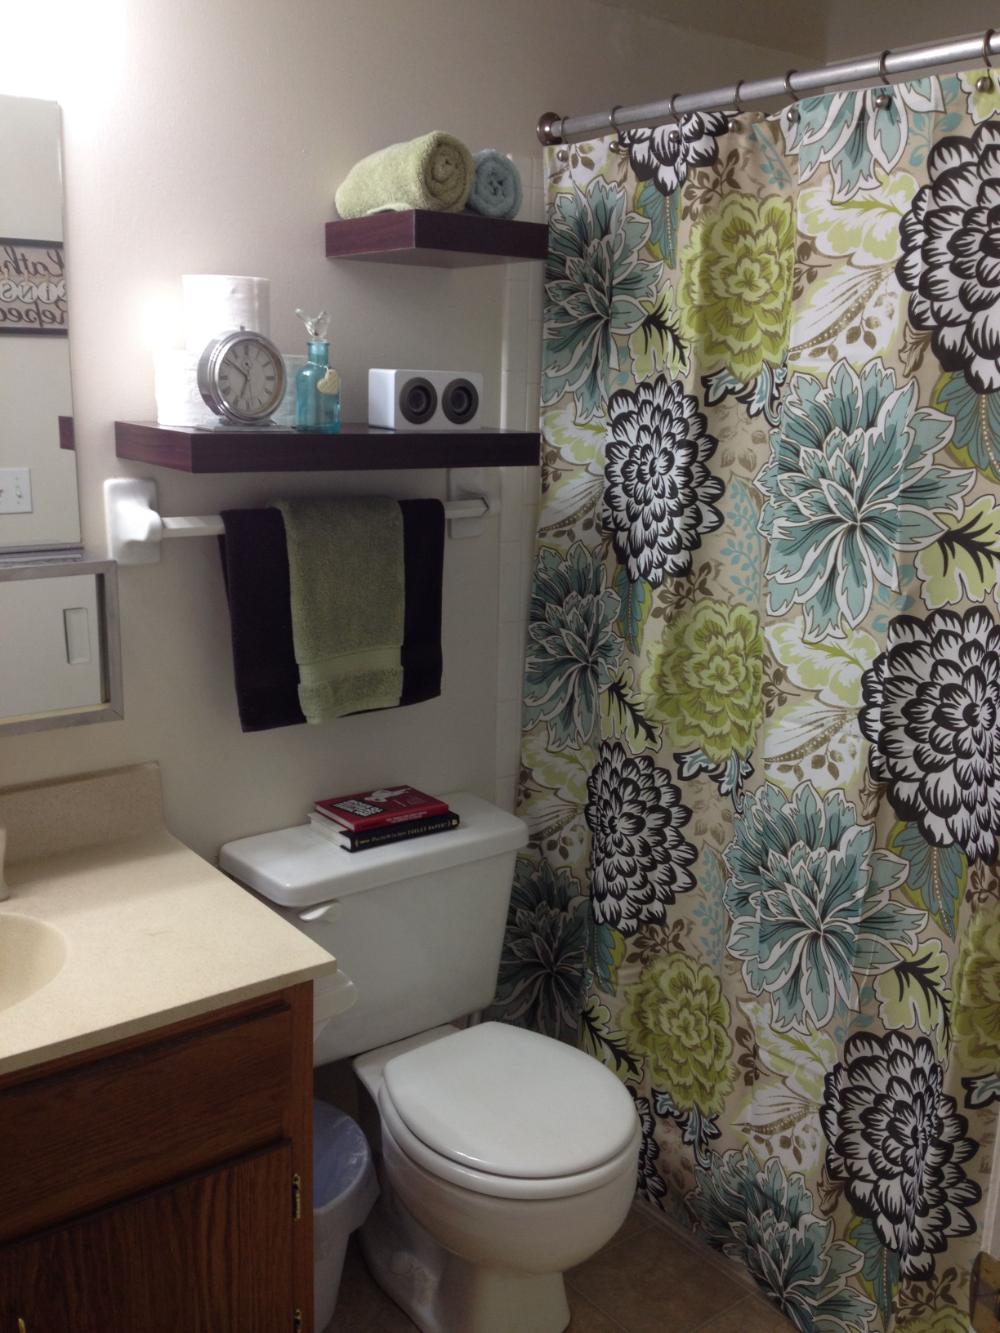 Apartment Bathroom Decorating Ideas Pinterest In 2020 Small Apartment Bathroom Bathroom Decor Apartment Diy Bathroom Decor